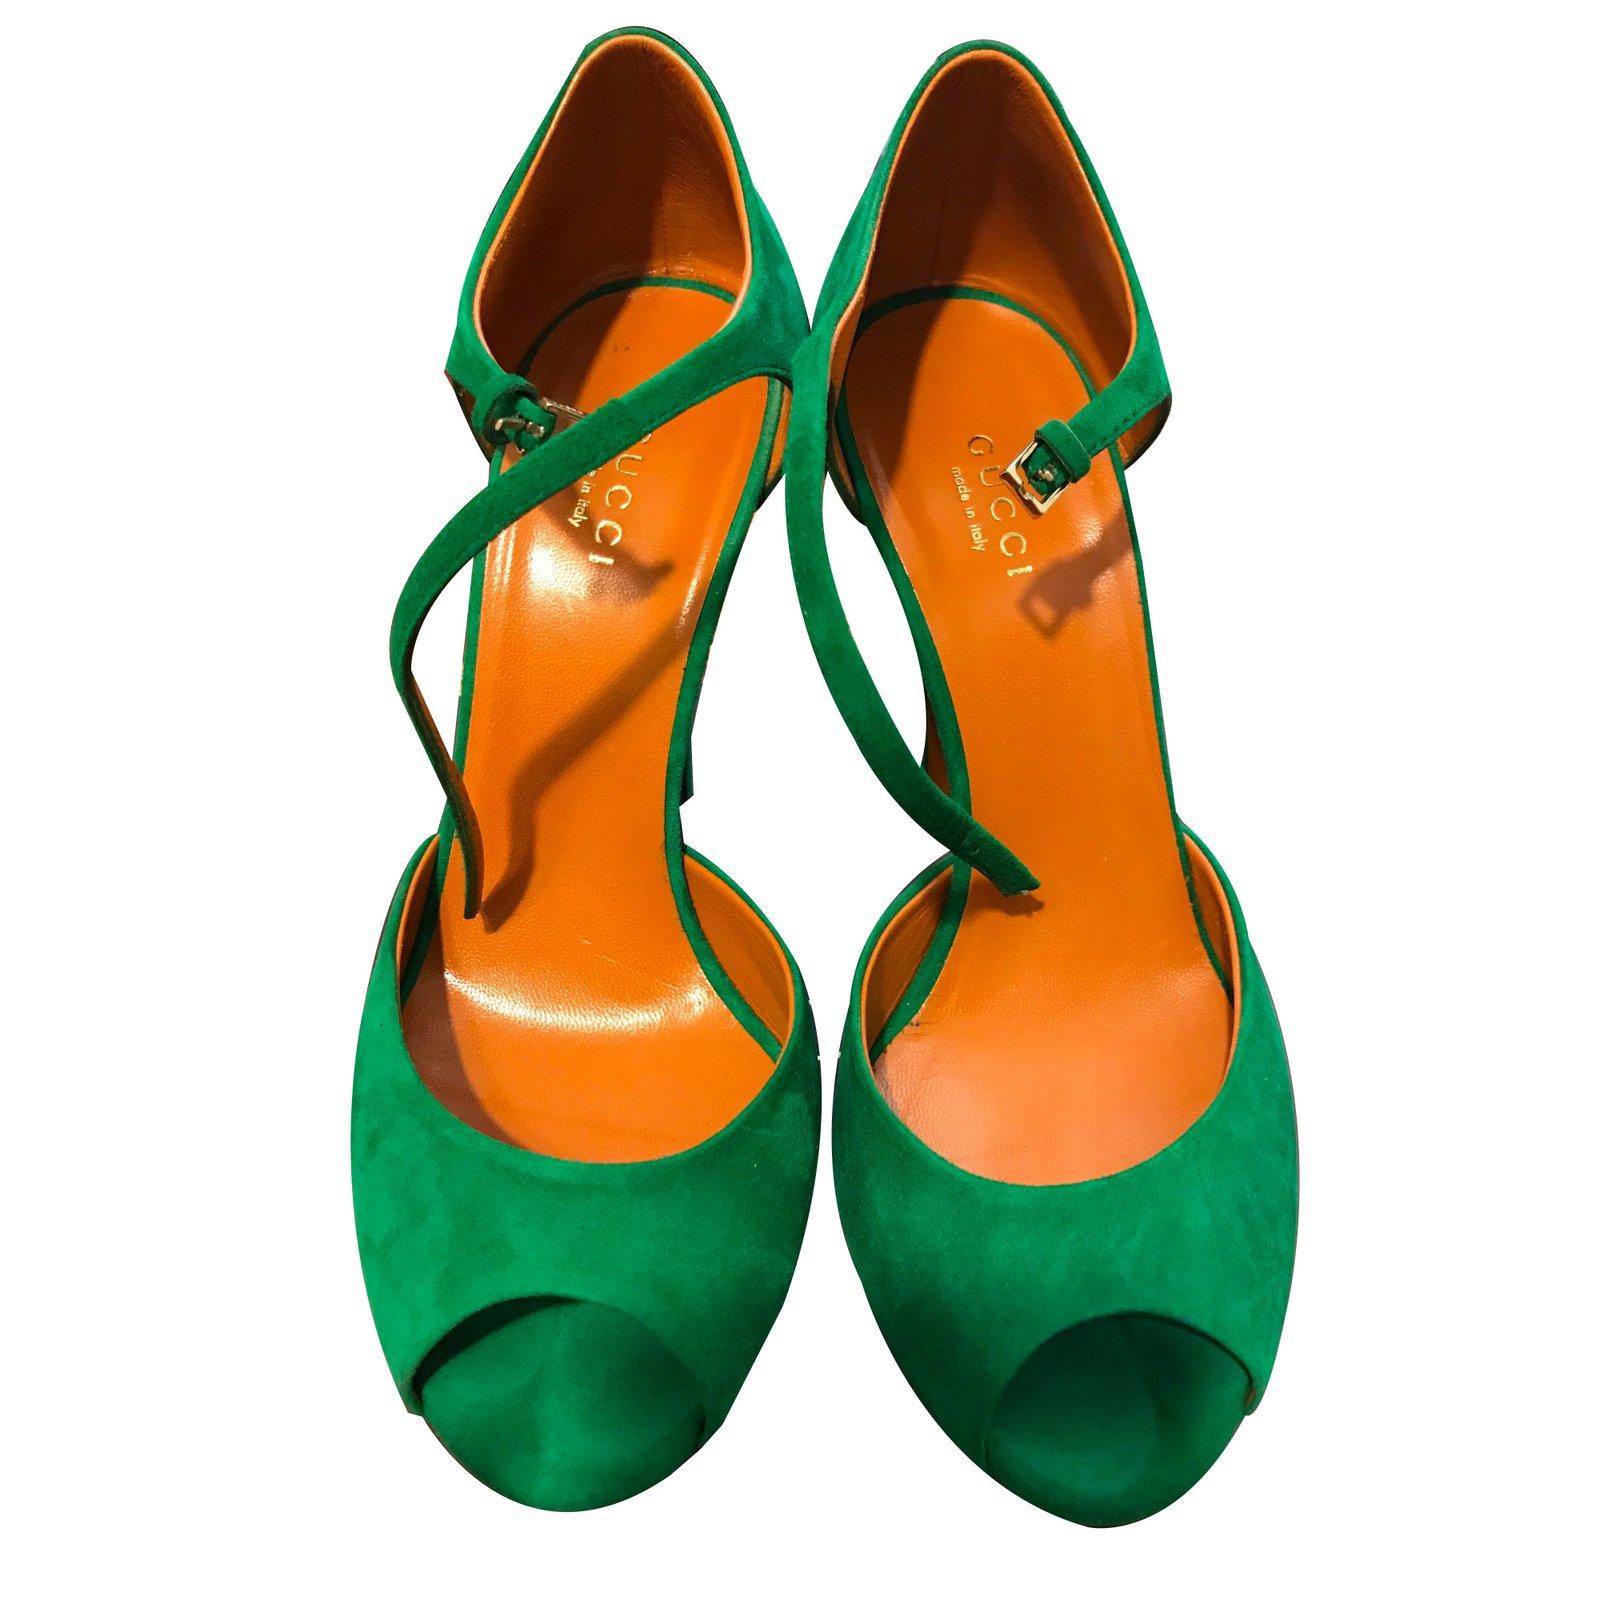 08095d1b8d3 Gucci Sandals Sandals Leather Green ref.69504 - Joli Closet